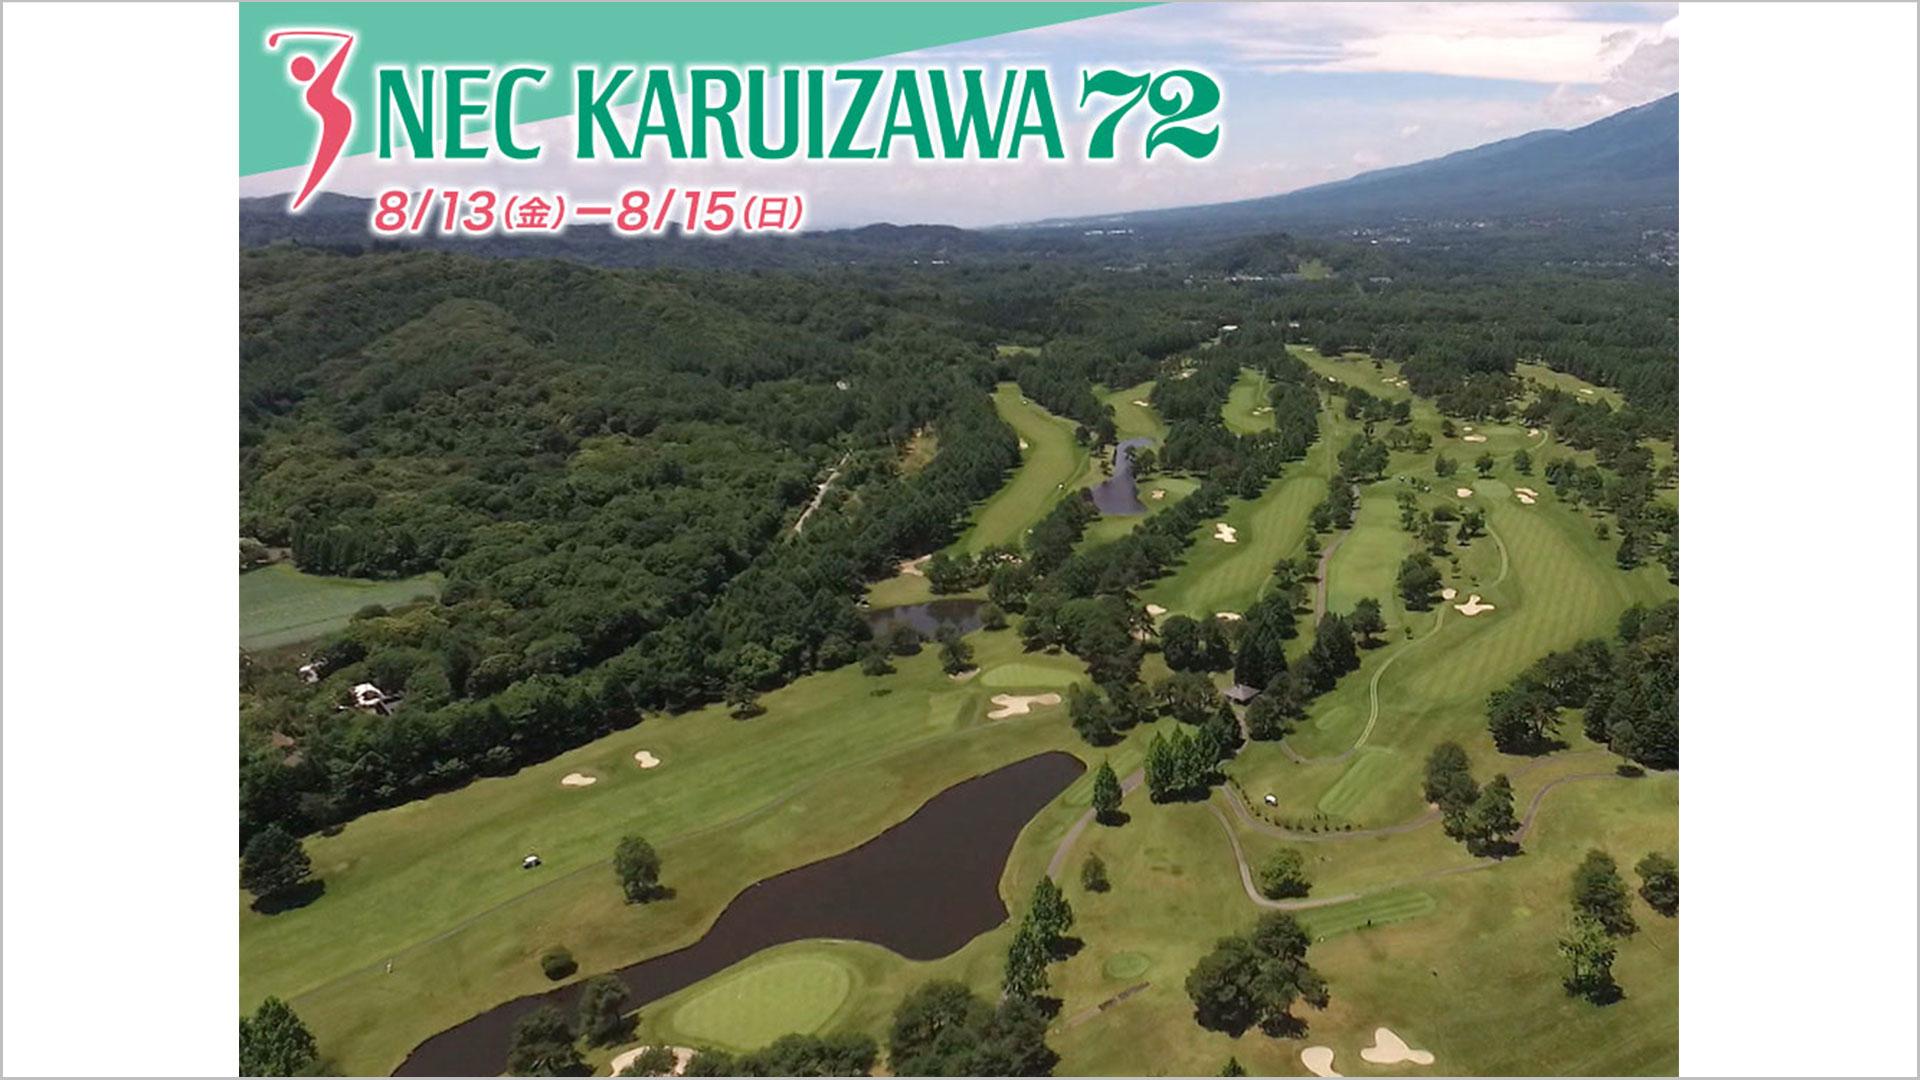 NEC軽井沢72ゴルフトーナメント2021